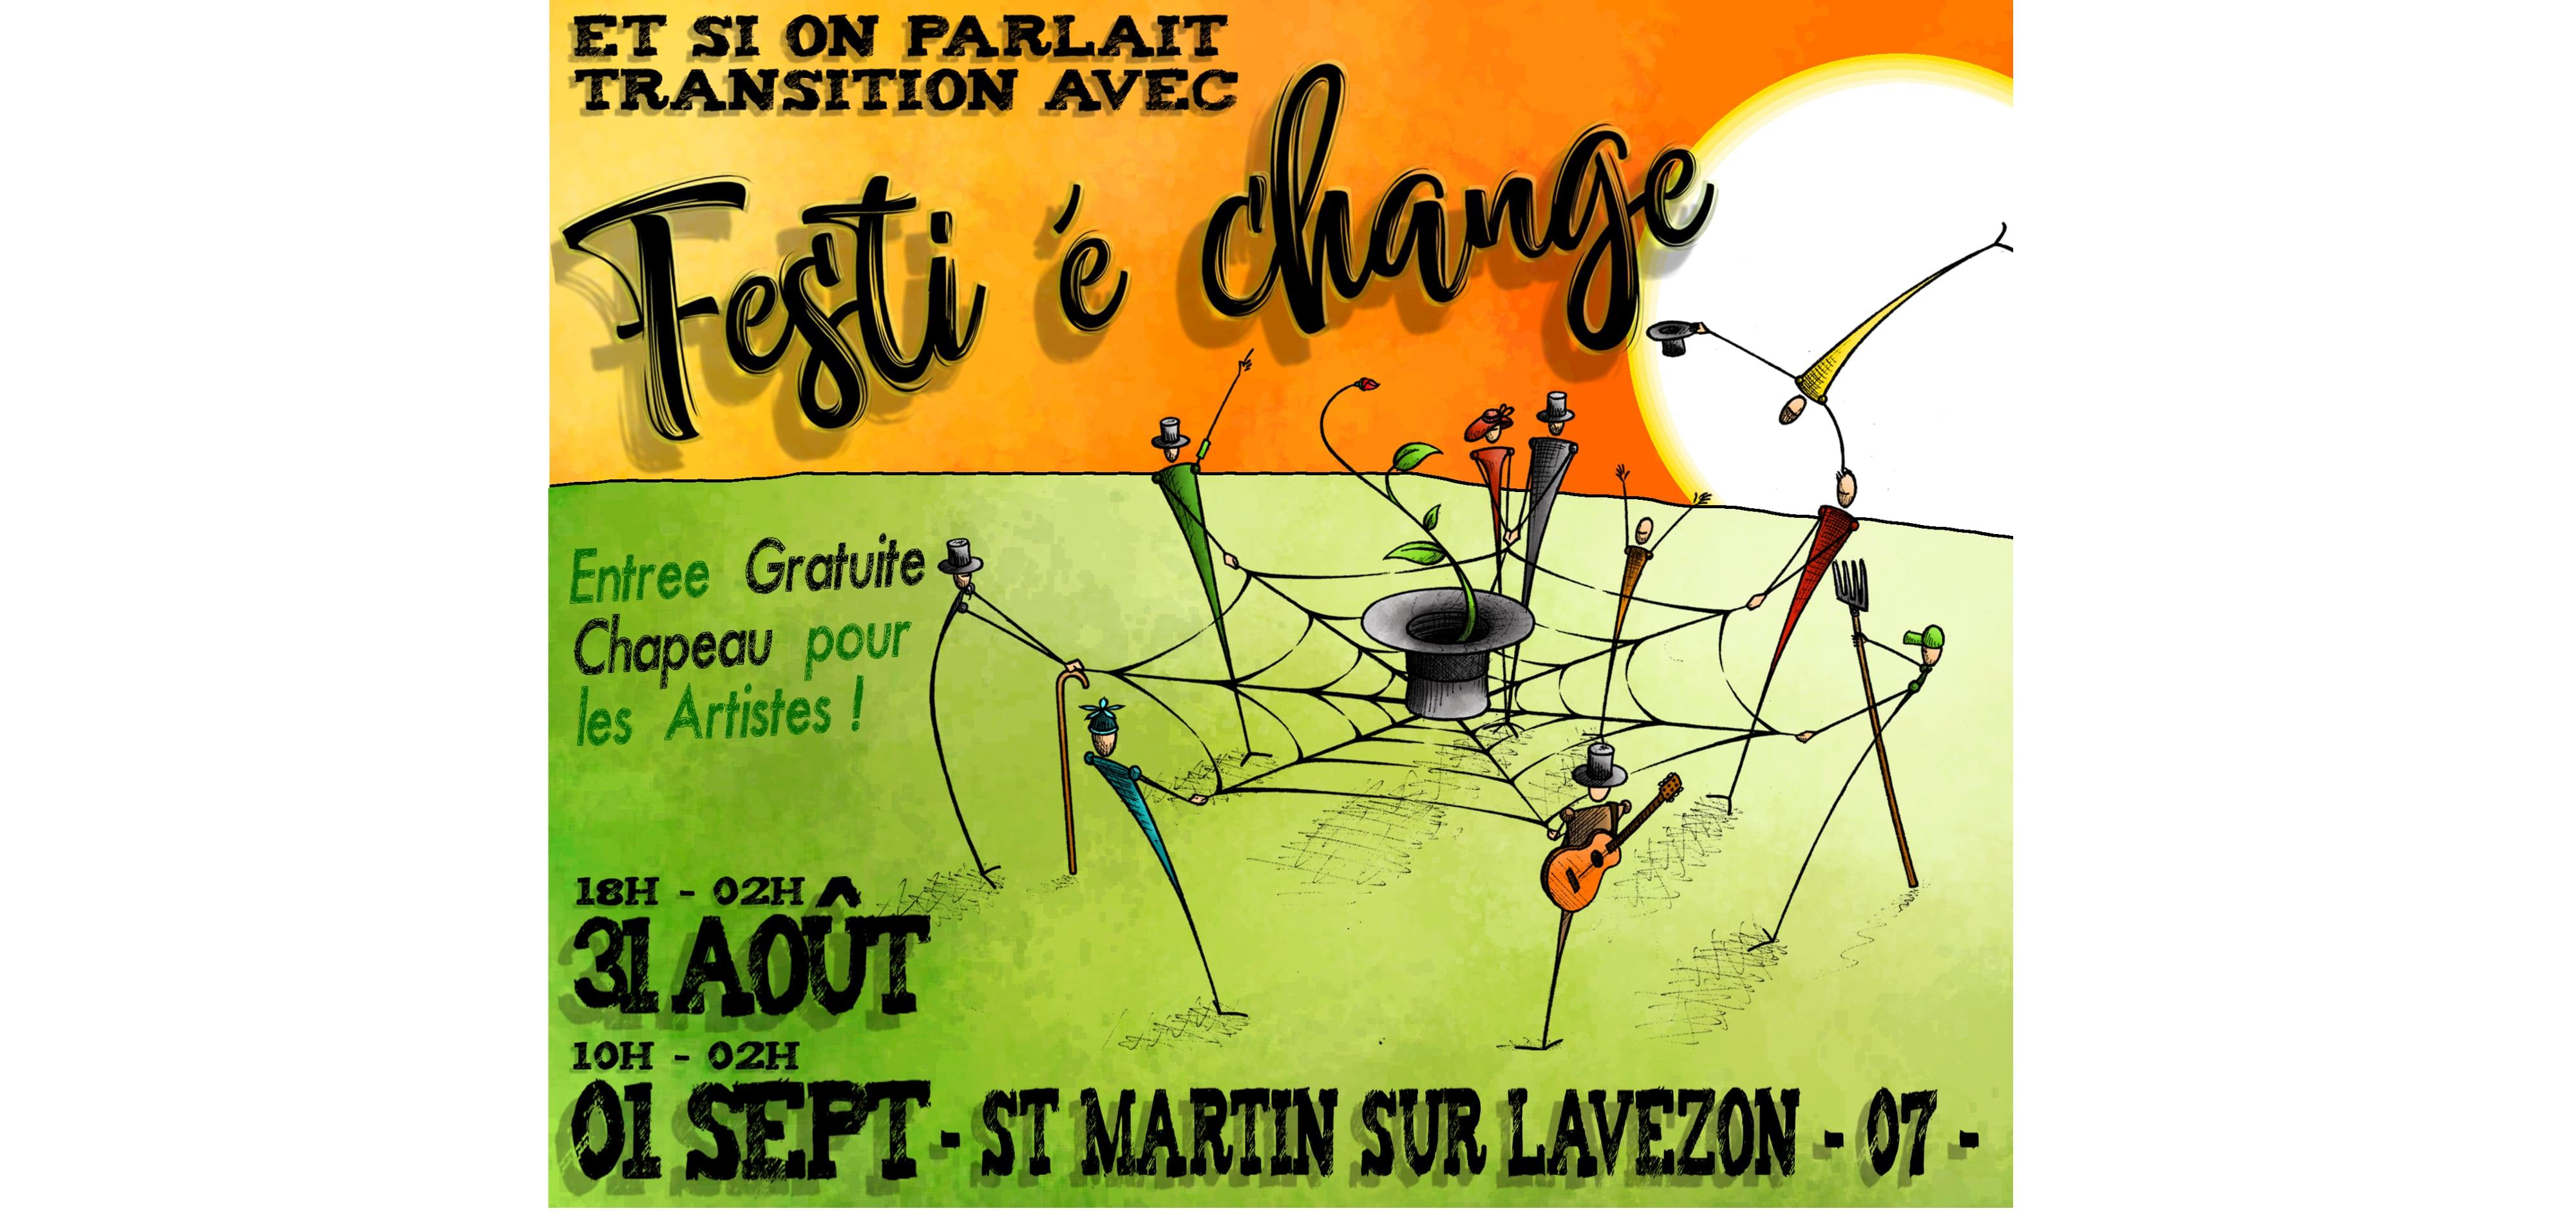 FESTI E CHANGE